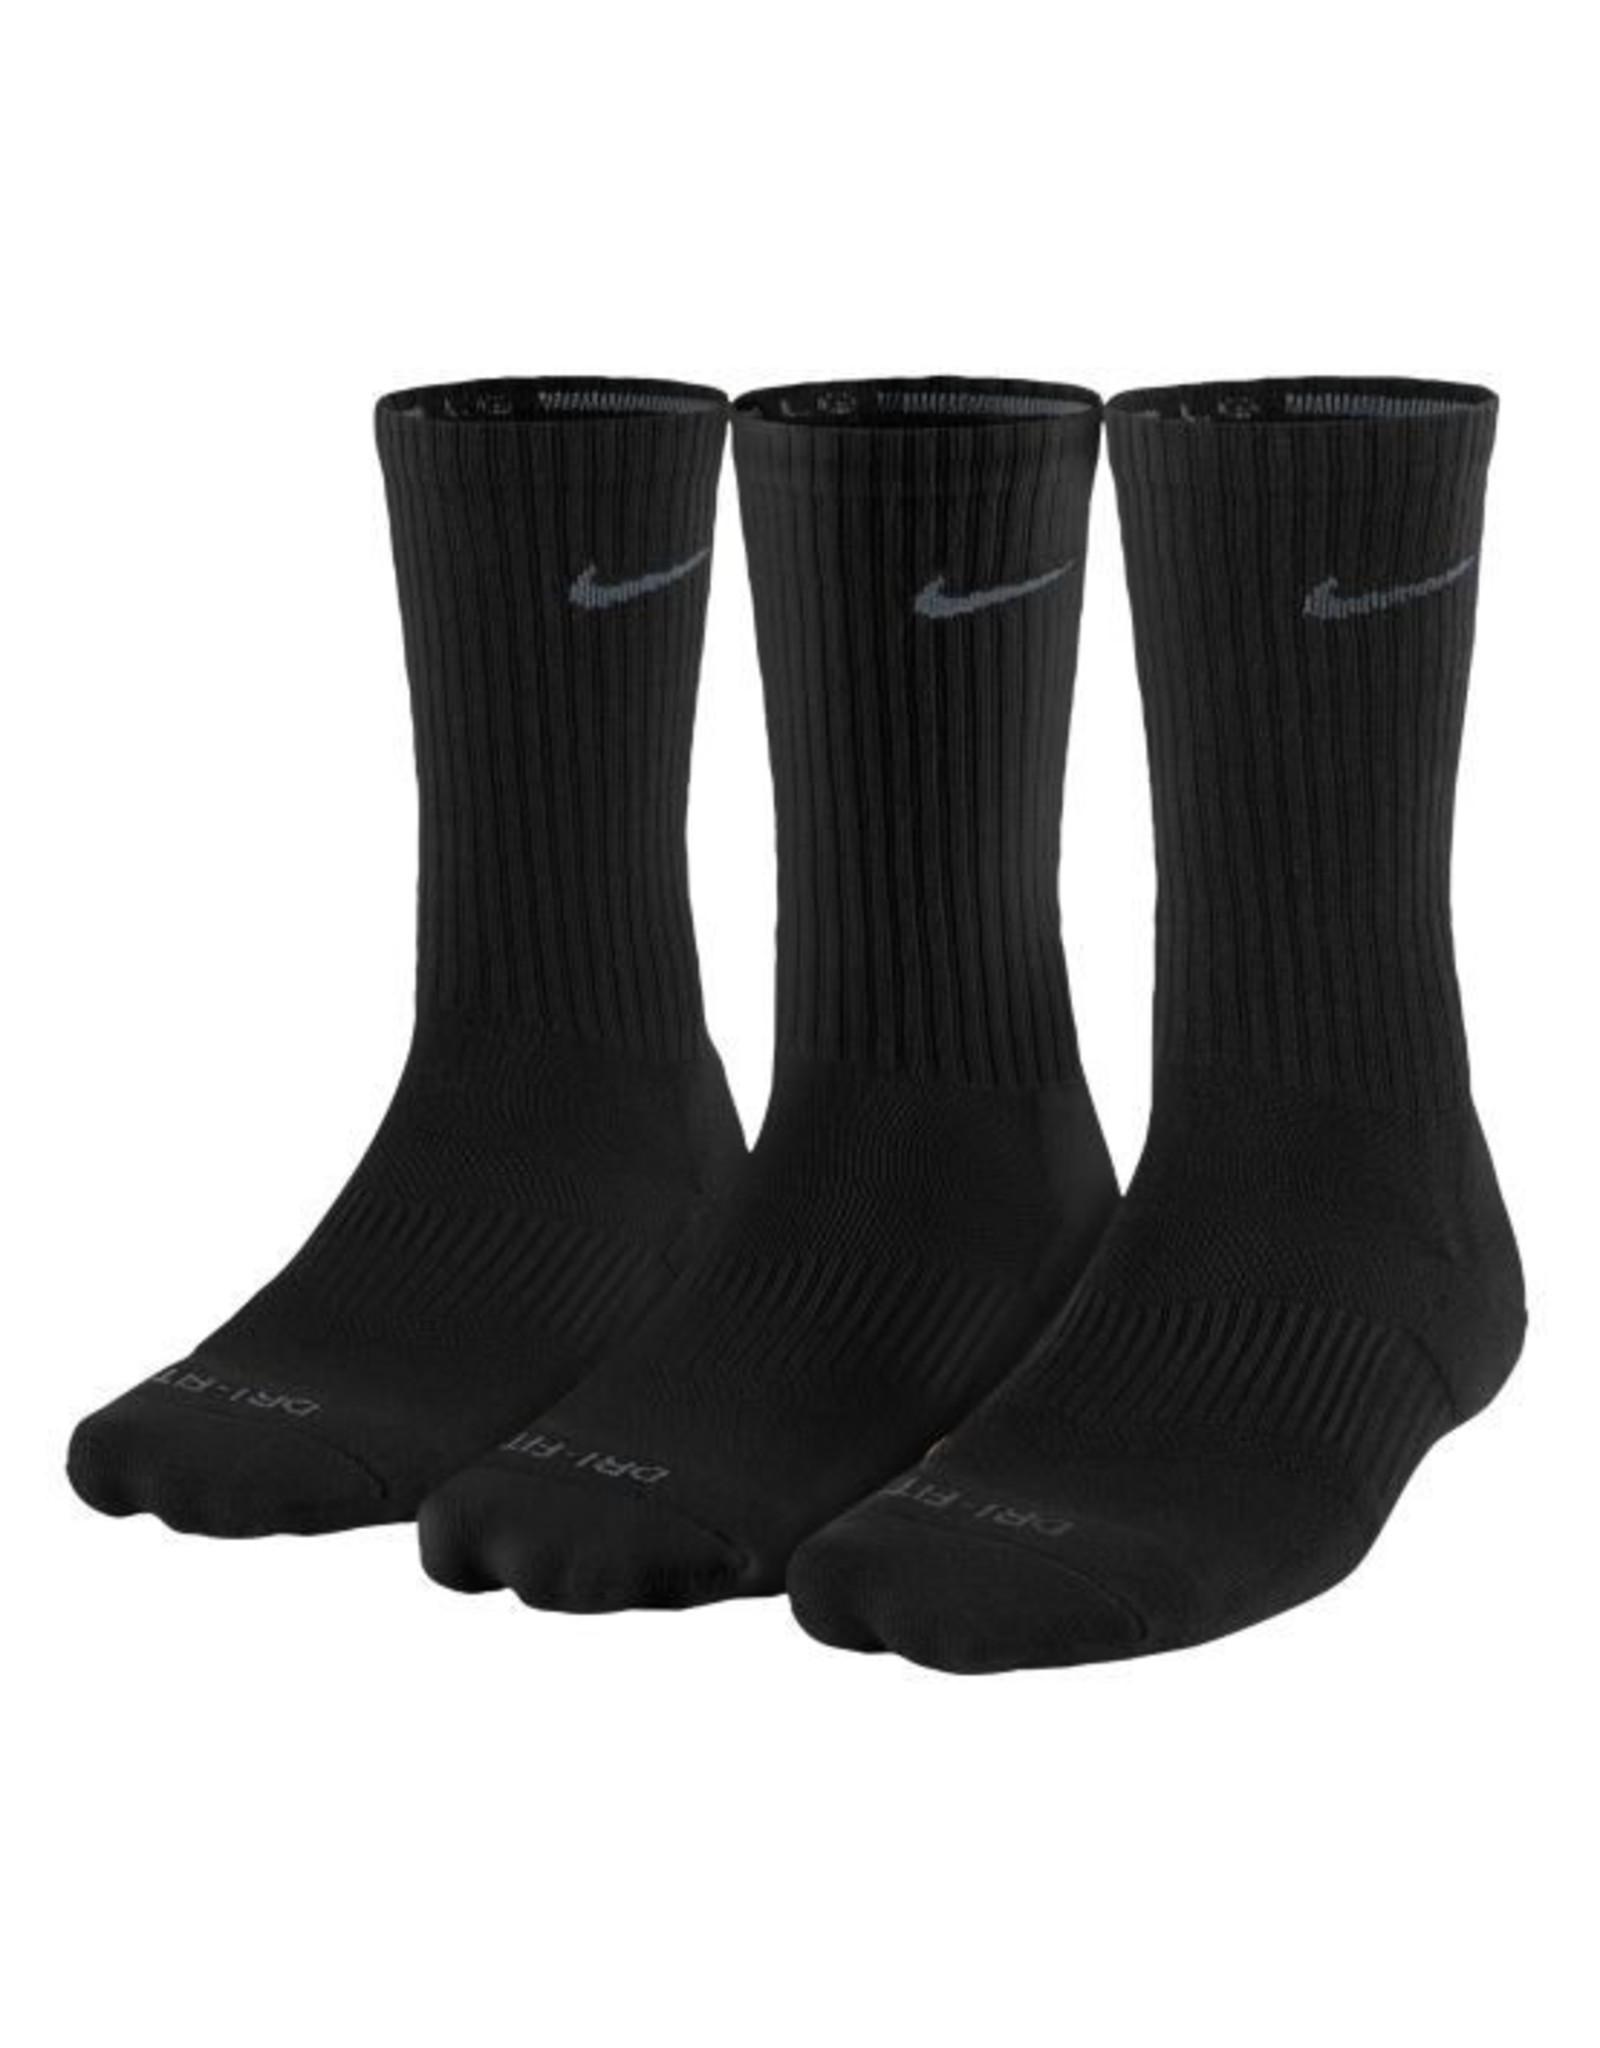 NON-UNIFORM Nike 3pk Dri-Fit 1/2 Crew Sock